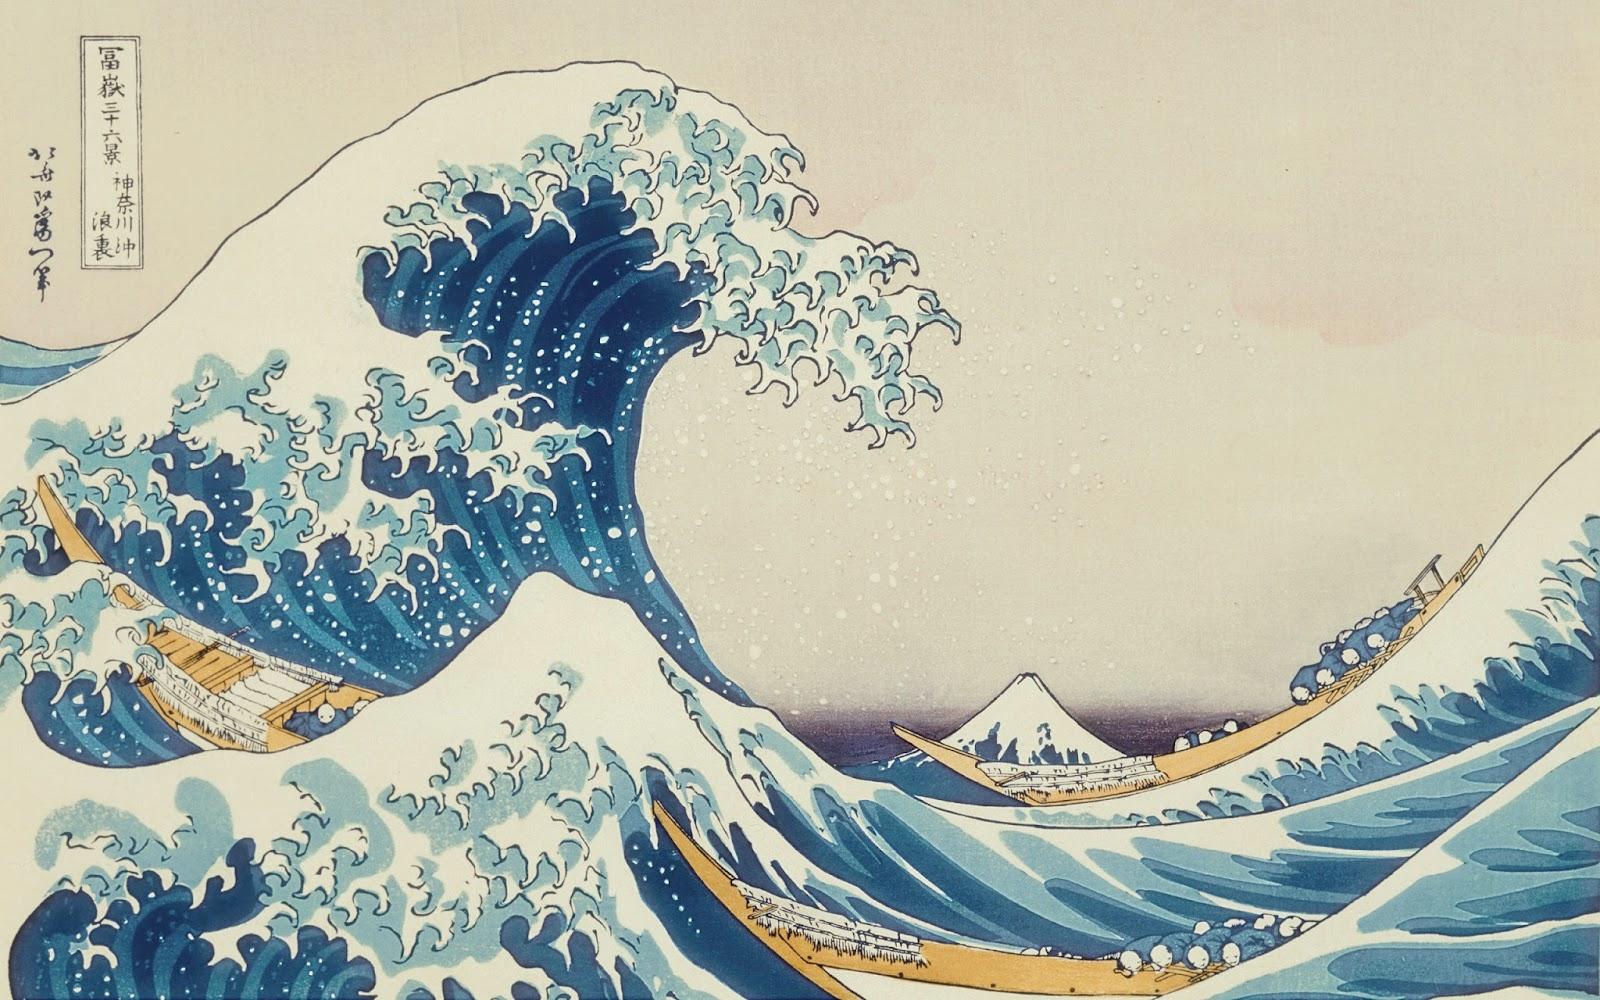 Iraccontidelcassetto Londa Di Hokusai